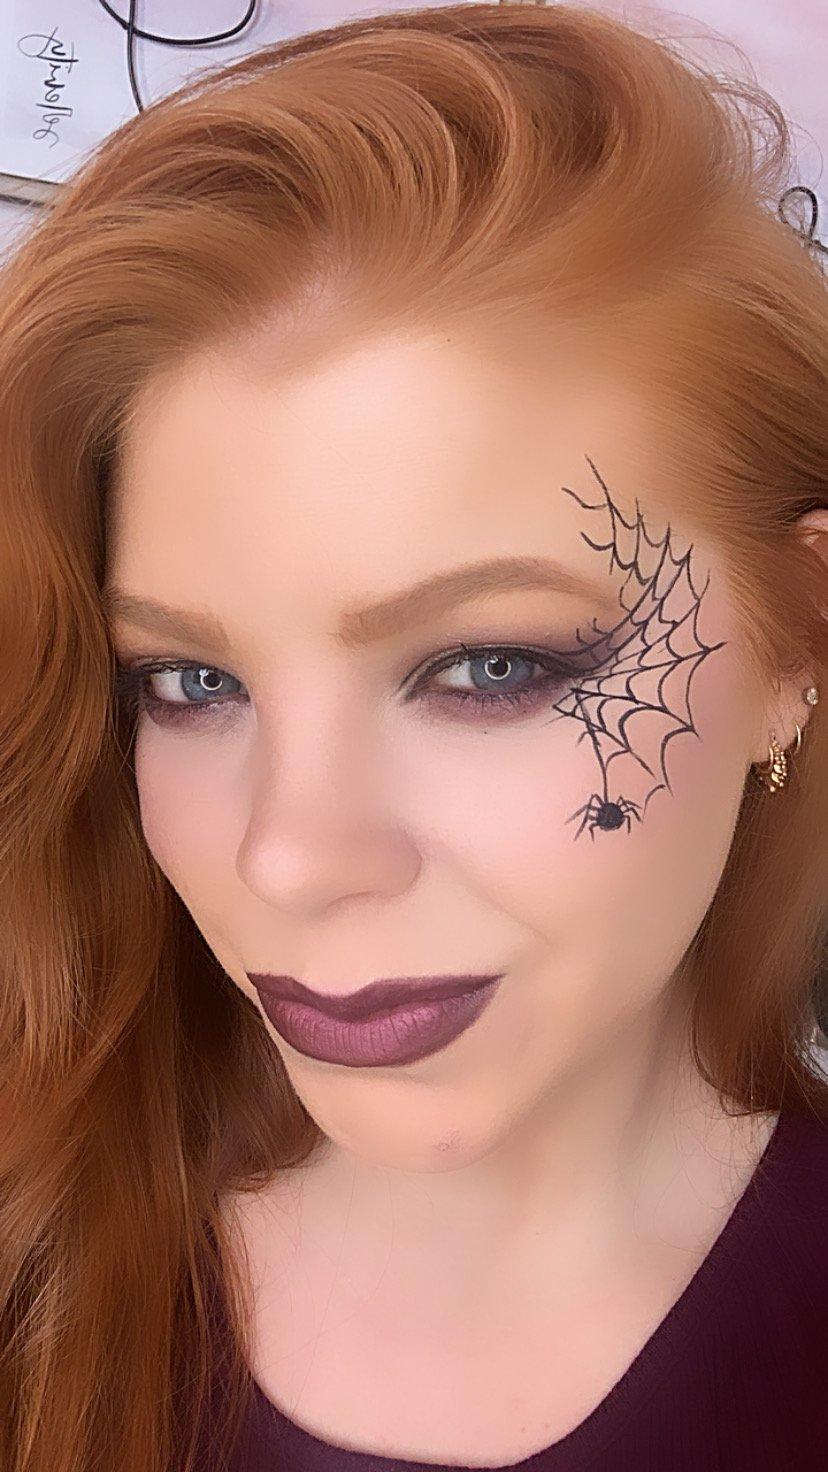 Halloween makeup with spider web